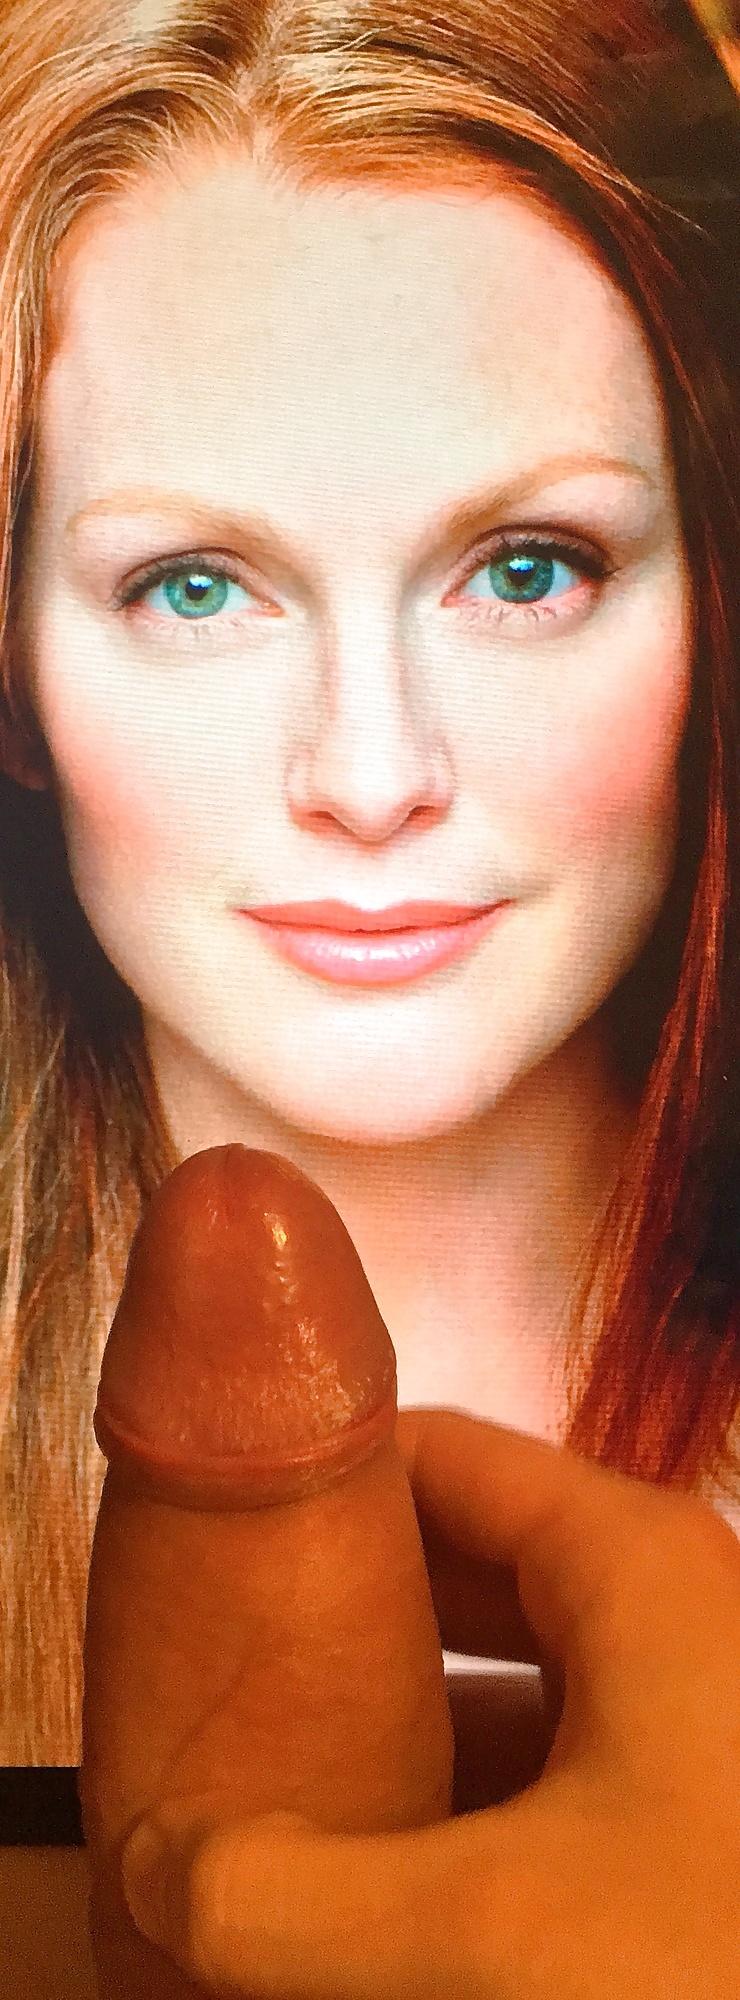 Amanda bynes fake porn expiring desires, clockwork buns for your joys